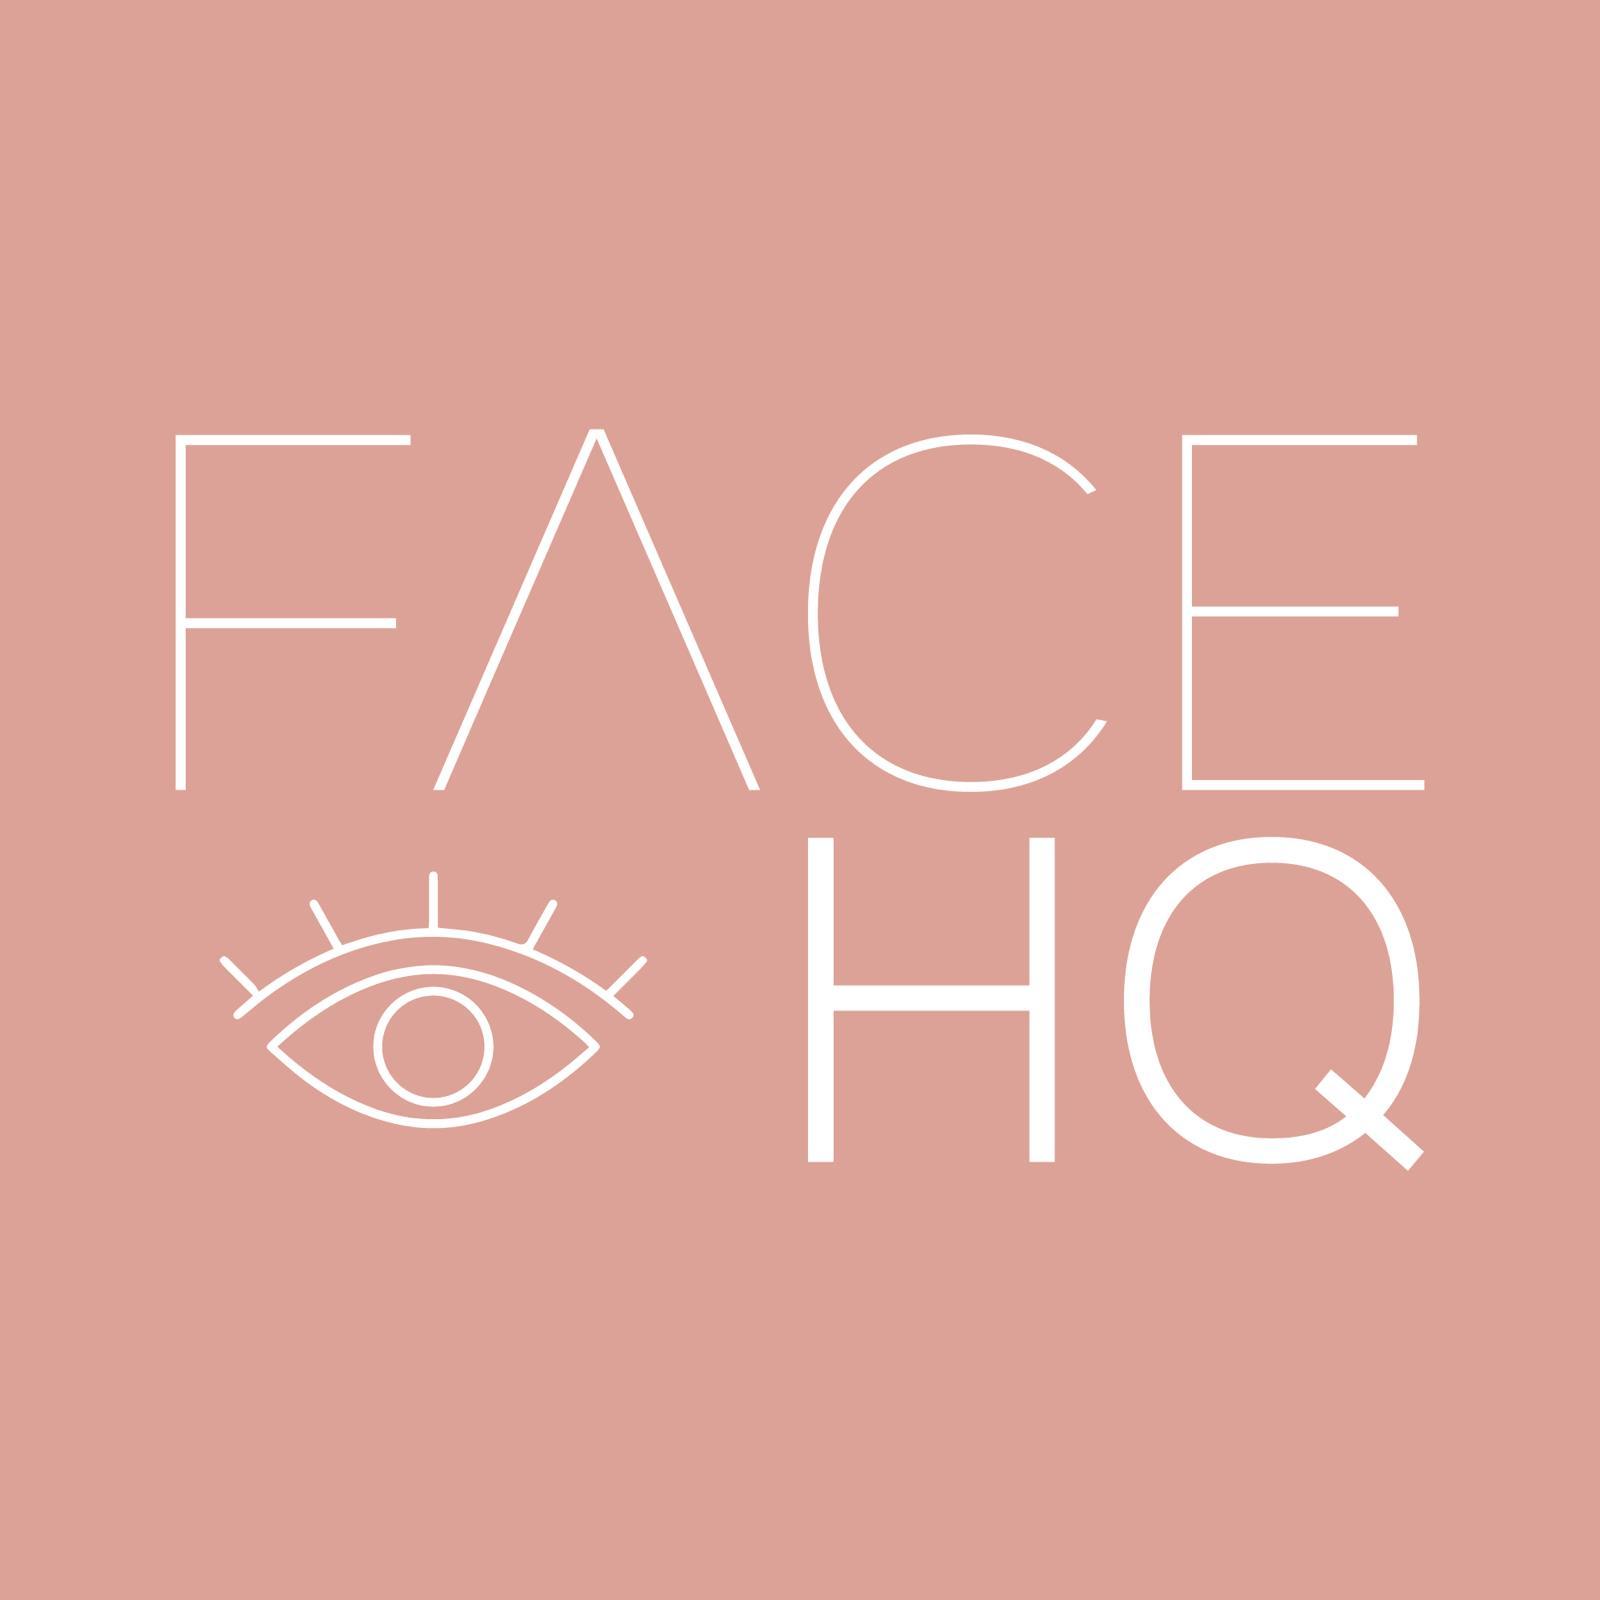 Face HQ